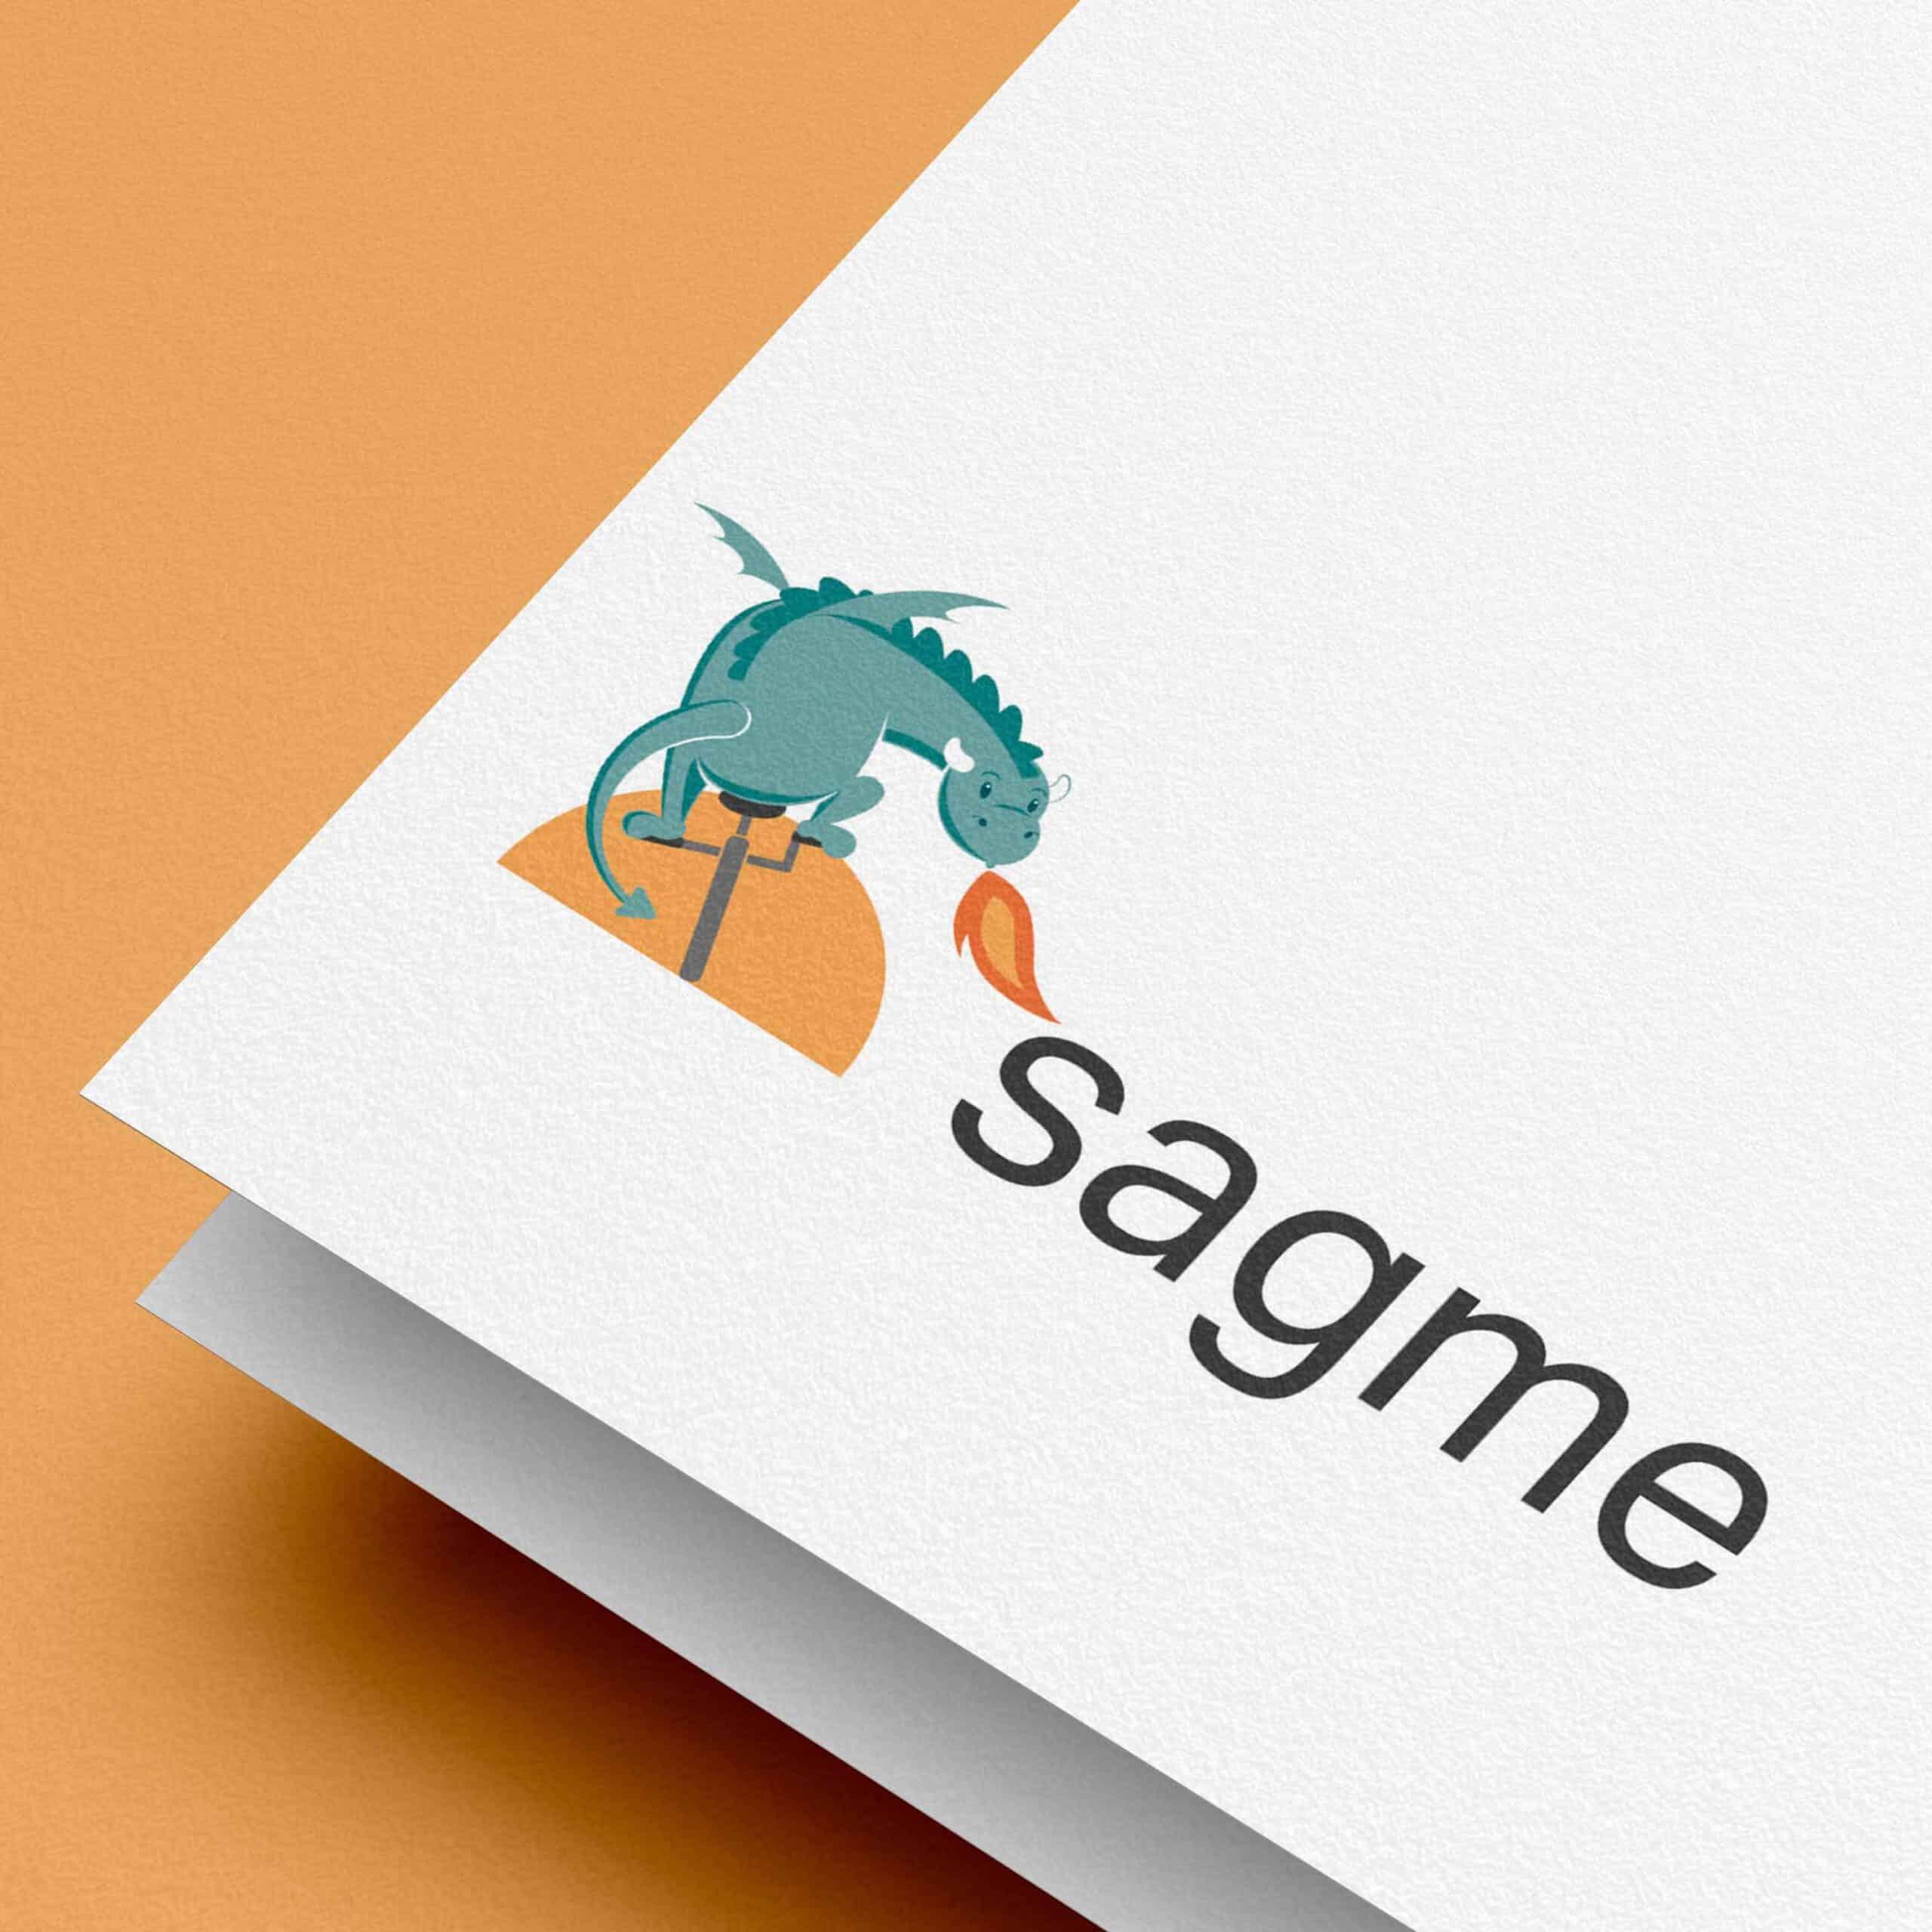 Logo Design for the company SagMe